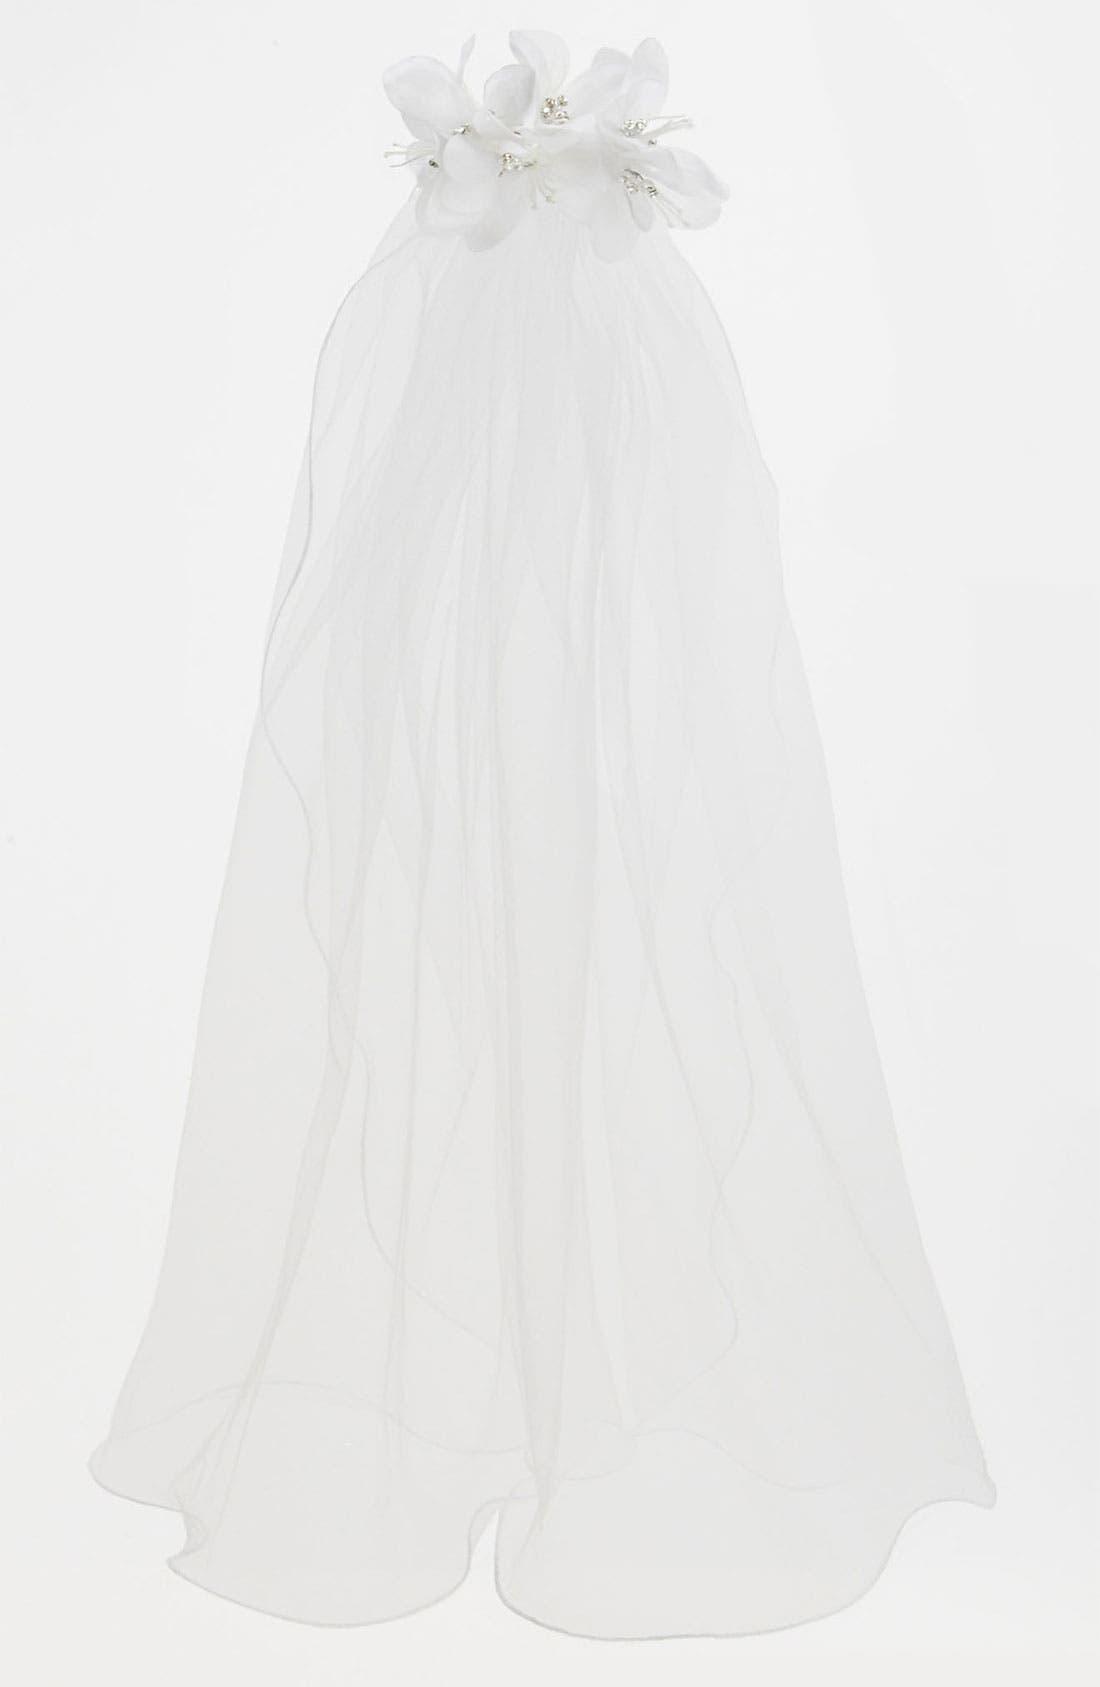 Alternate Image 1 Selected - Adrianna Cupelli 'Magnolia' Barrette Veil (Girls)